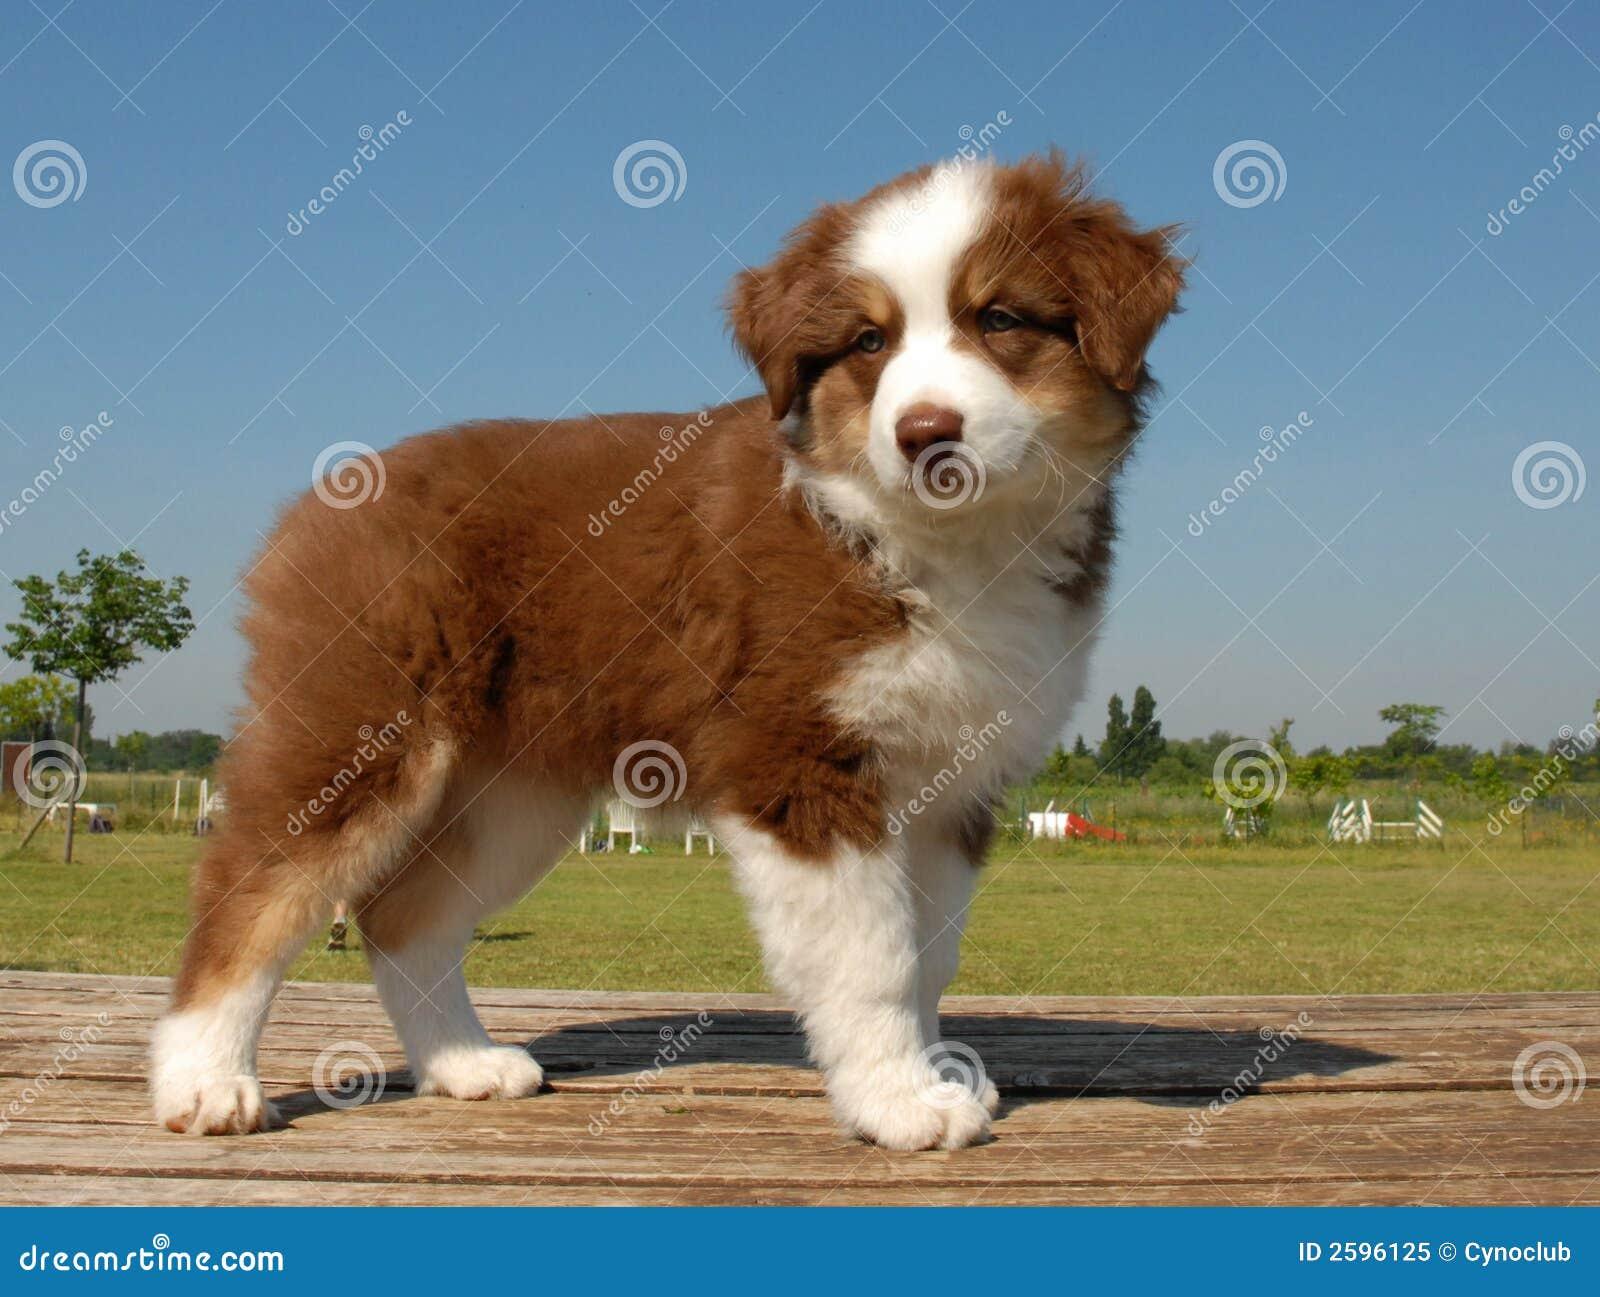 Puppy Australian Shepherd Royalty Free Stock Photo - Image: 2596125